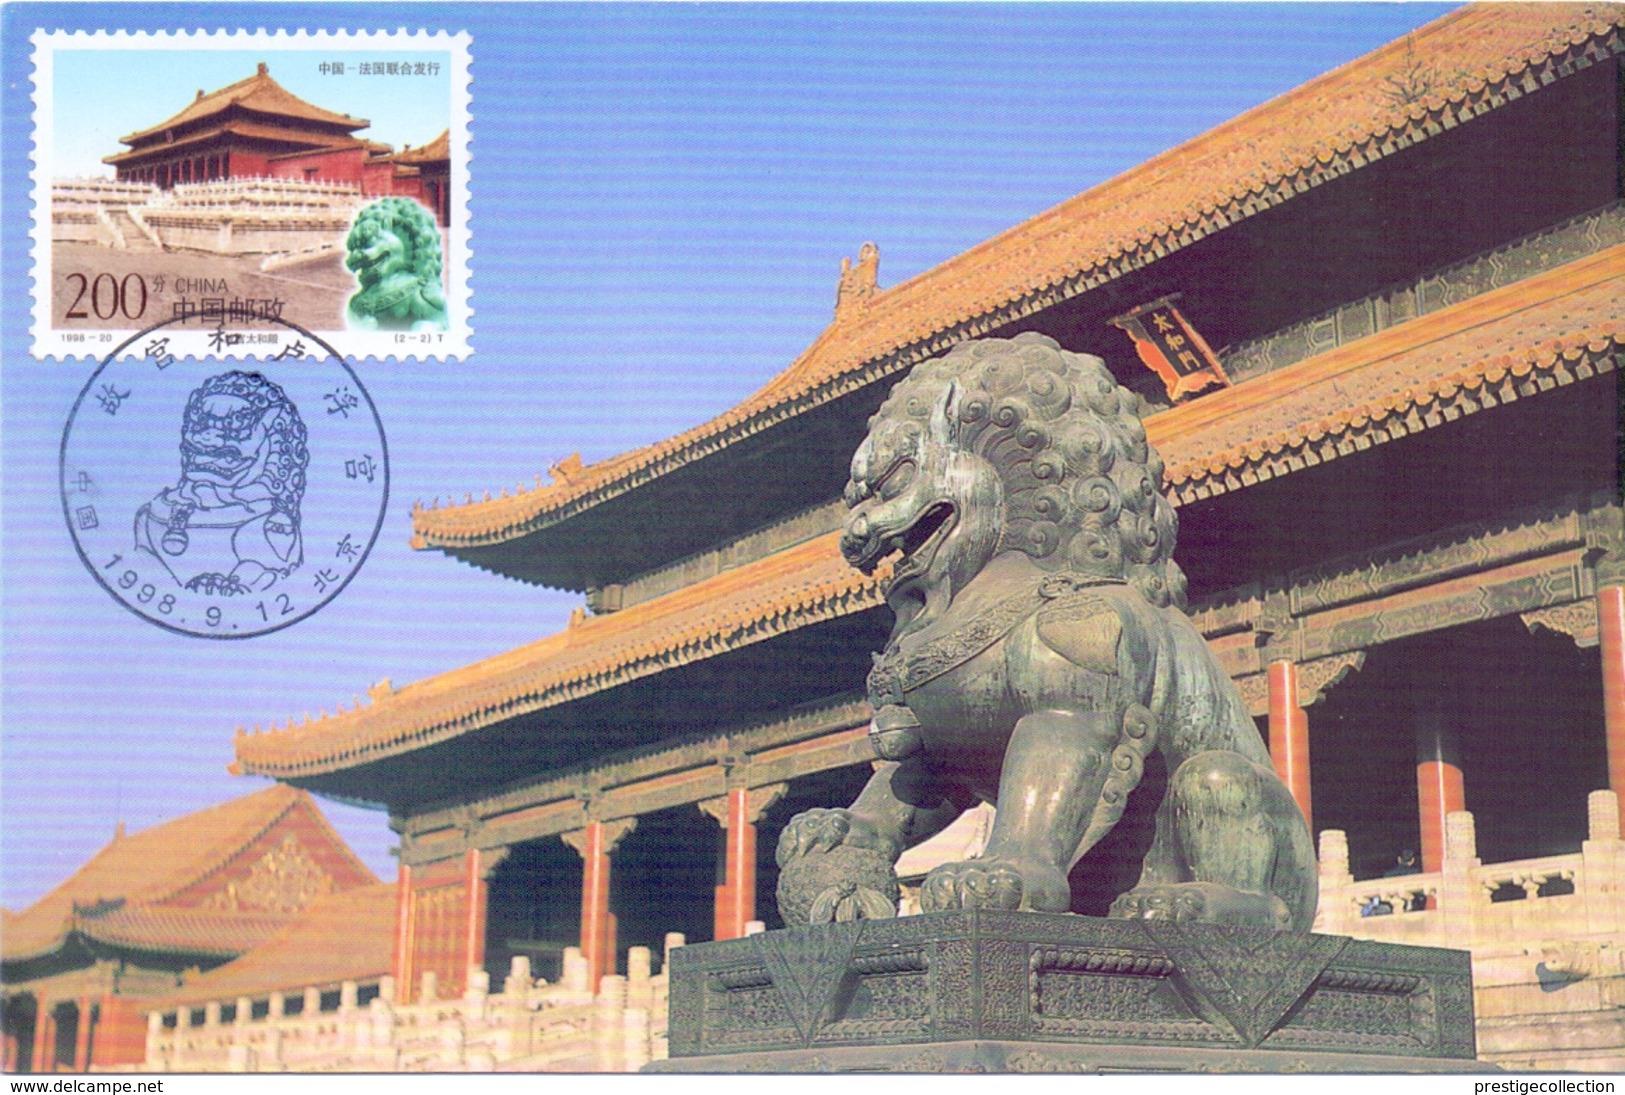 CINA THE POST OFFICE OF MENGHAI COUNTRY YUNAN PROVINCE  MAXIMUM POST CARD  (GENN200712) - 1949 - ... République Populaire